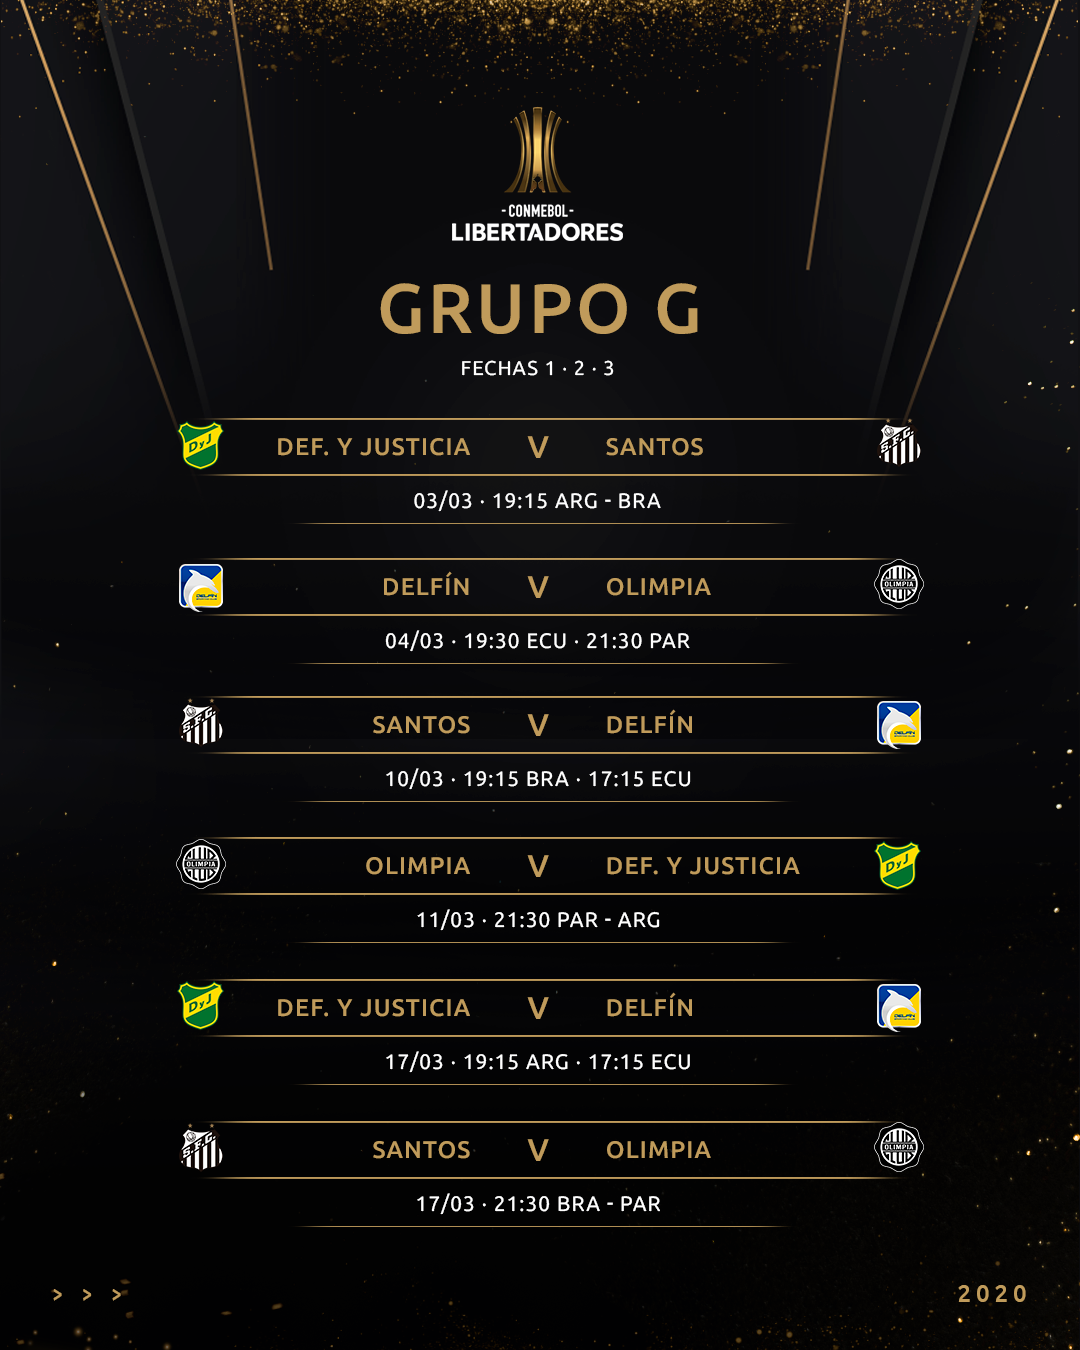 Grupo G fixture